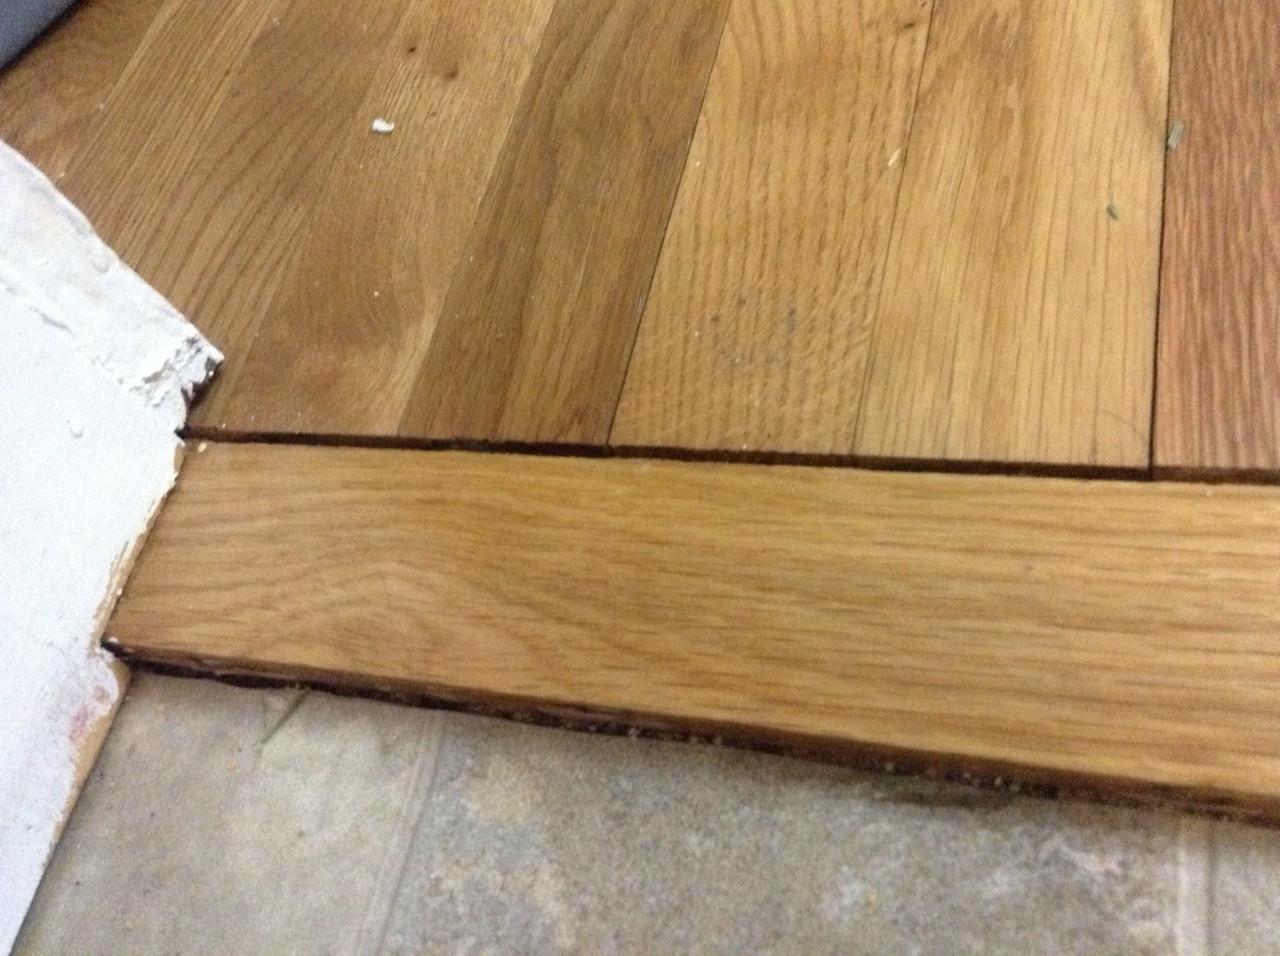 waxing hardwood floors yourself of wood floor techniques 101 inside gap shrinkage cork